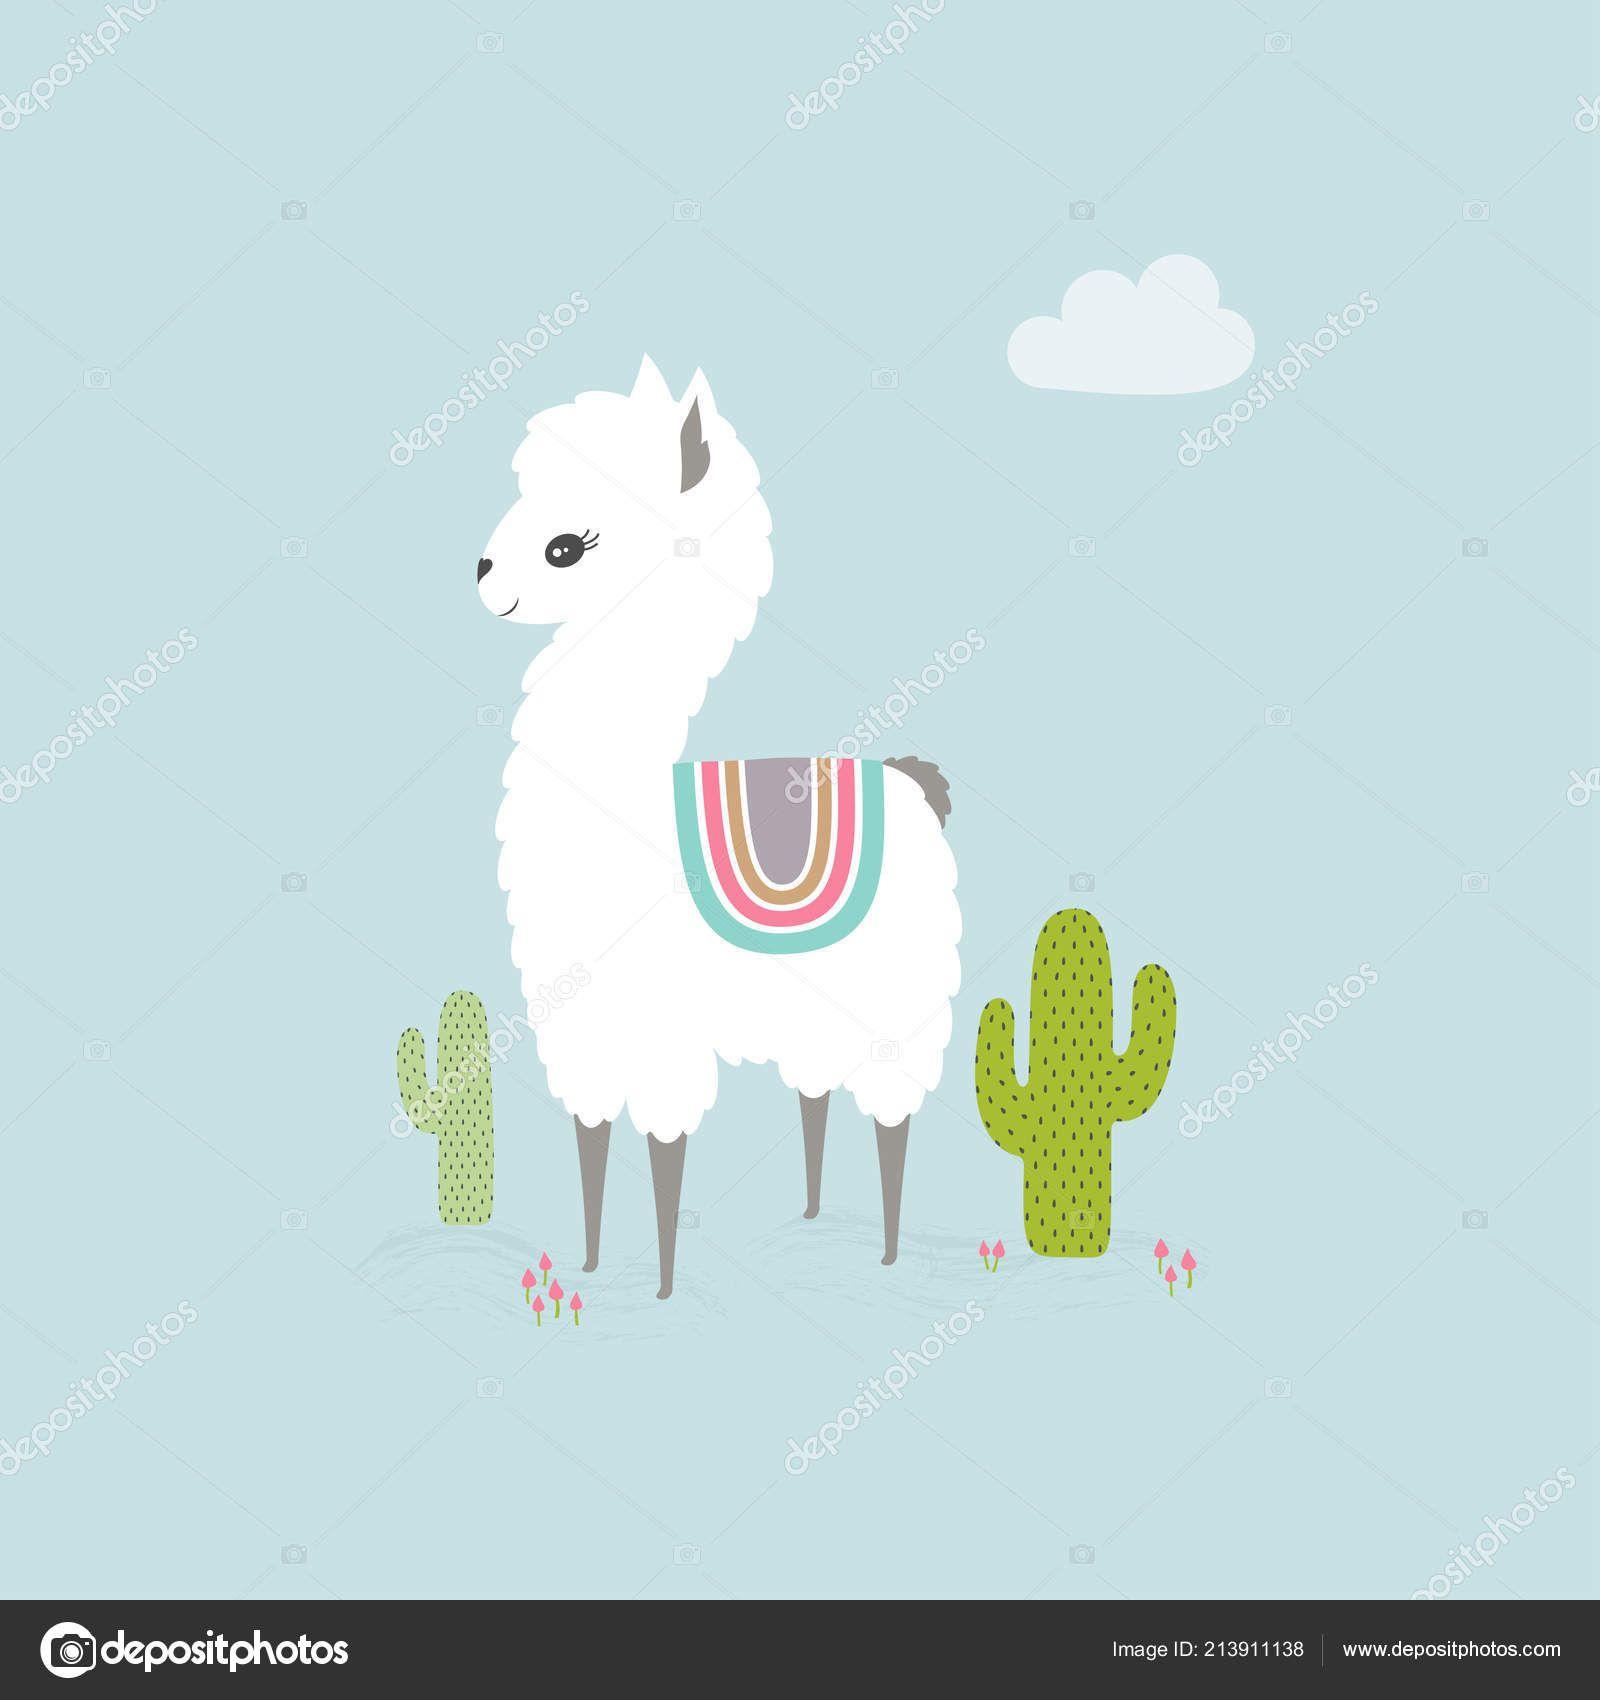 Cute Cartoon Llama Background Cacti With Images Cute